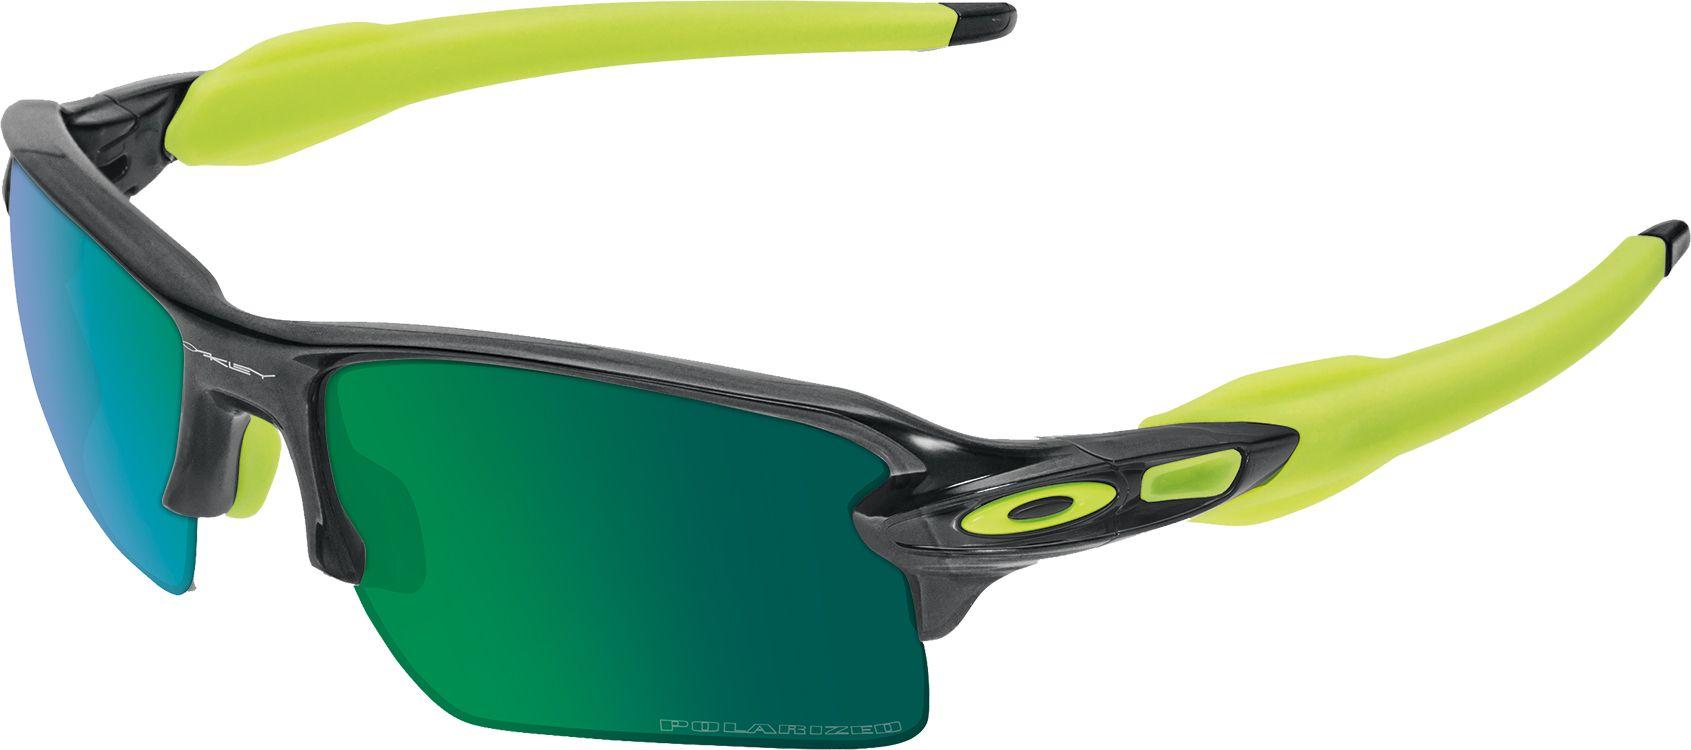 oakley polarised sunglasses  Oakley Flak 2.0 XL Polarized Sunglasses